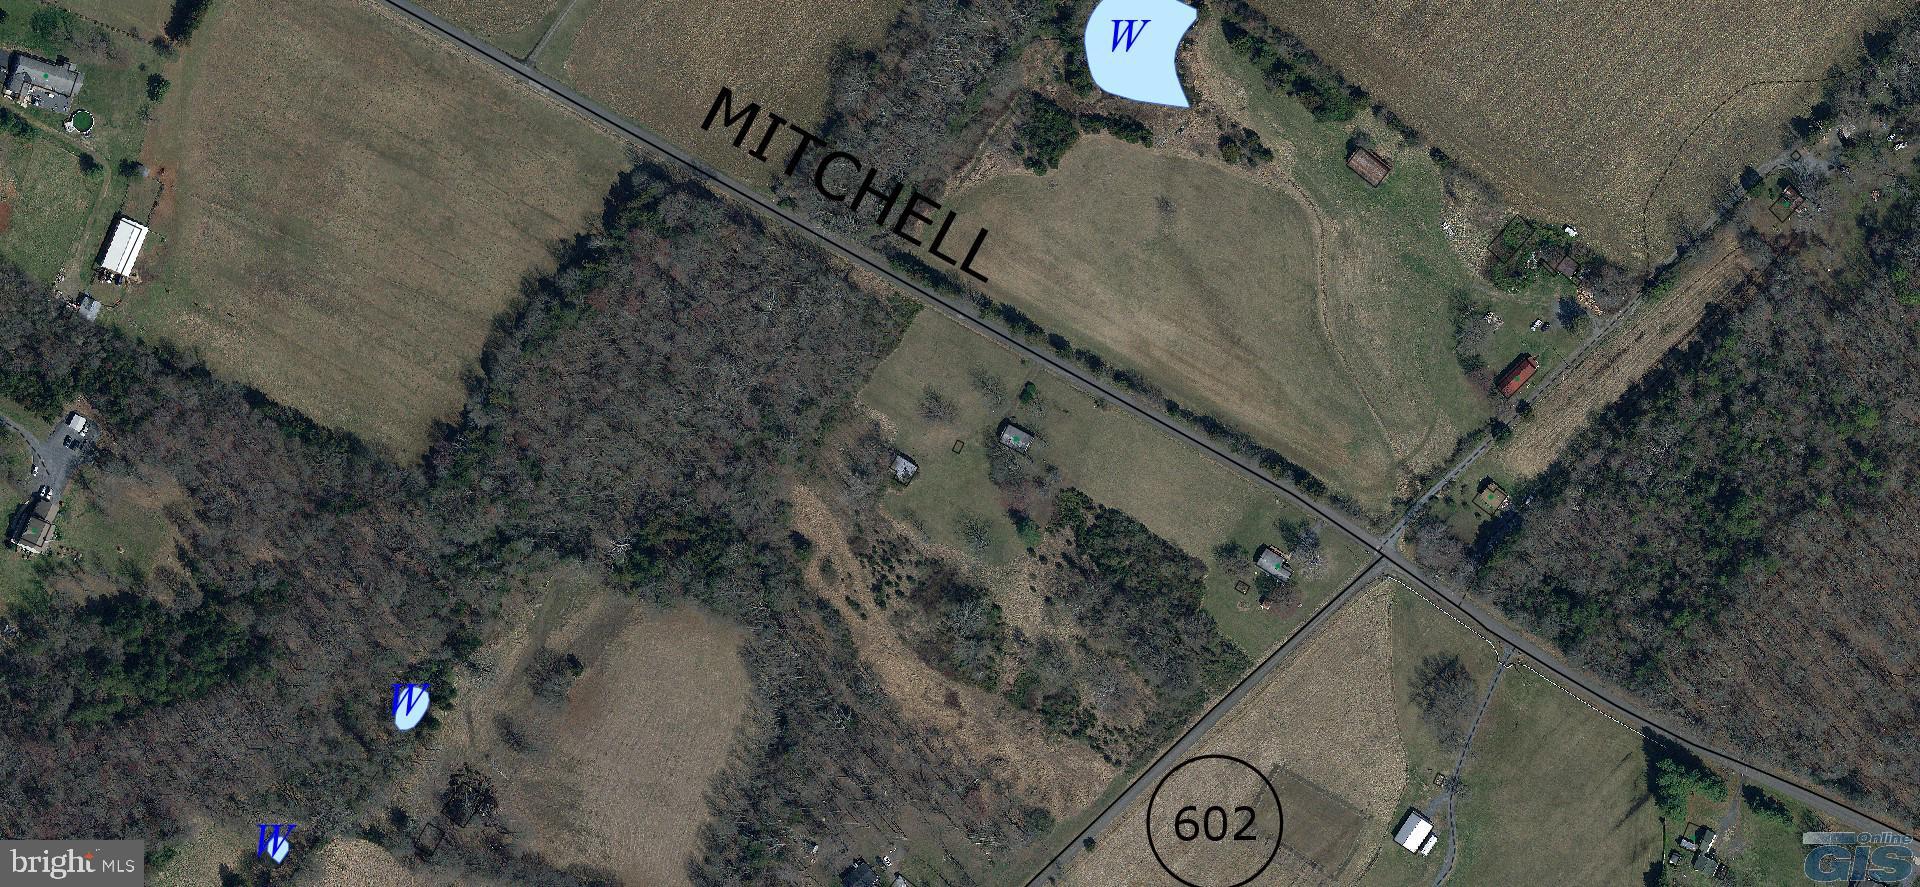 MITCHELLS, MITCHELLS, VA 22729